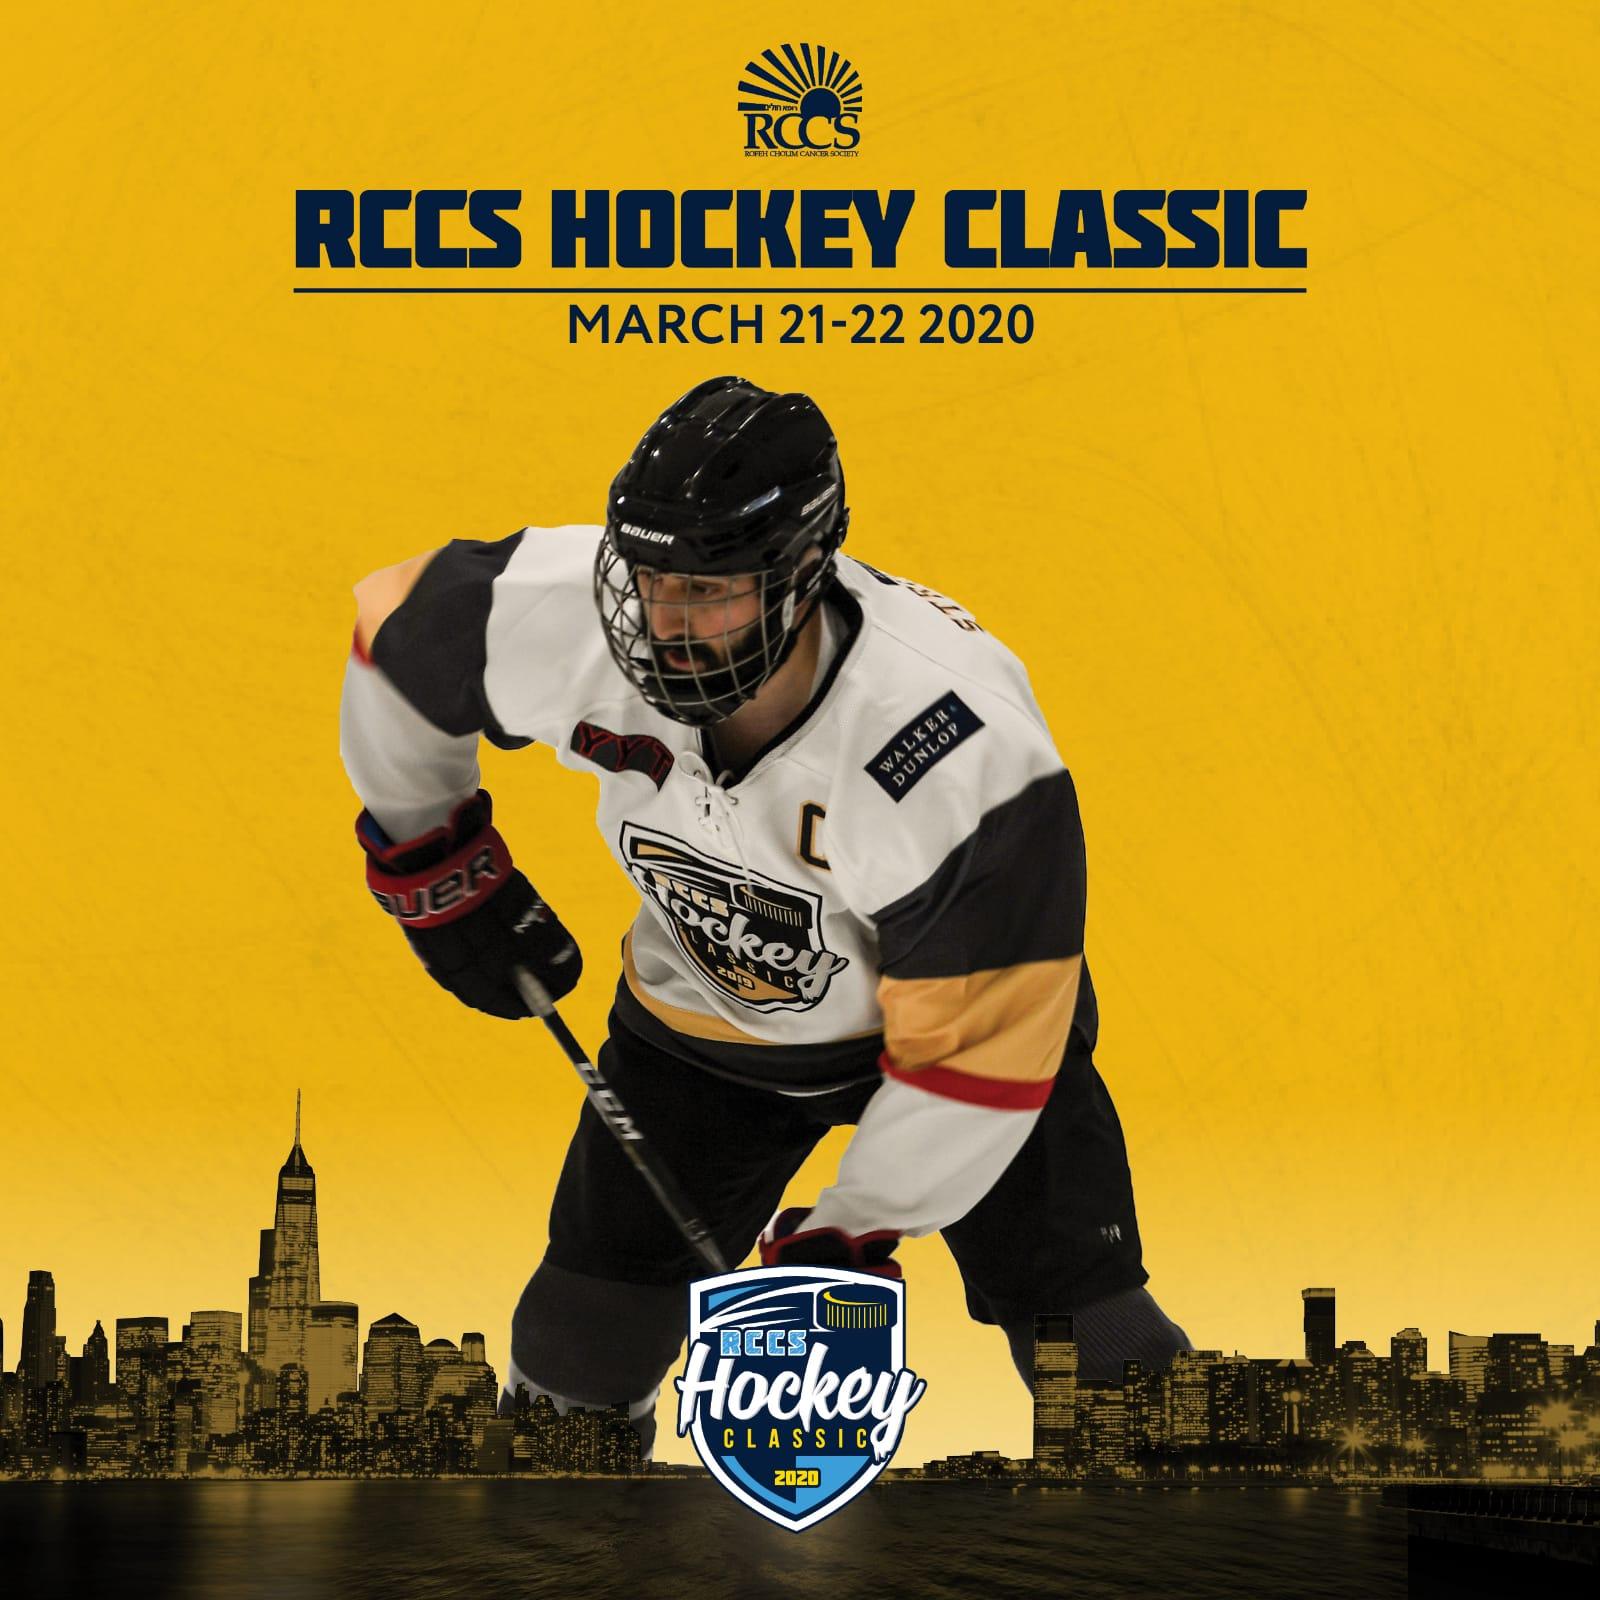 RCCS HOCKEY CLASSIC 2020